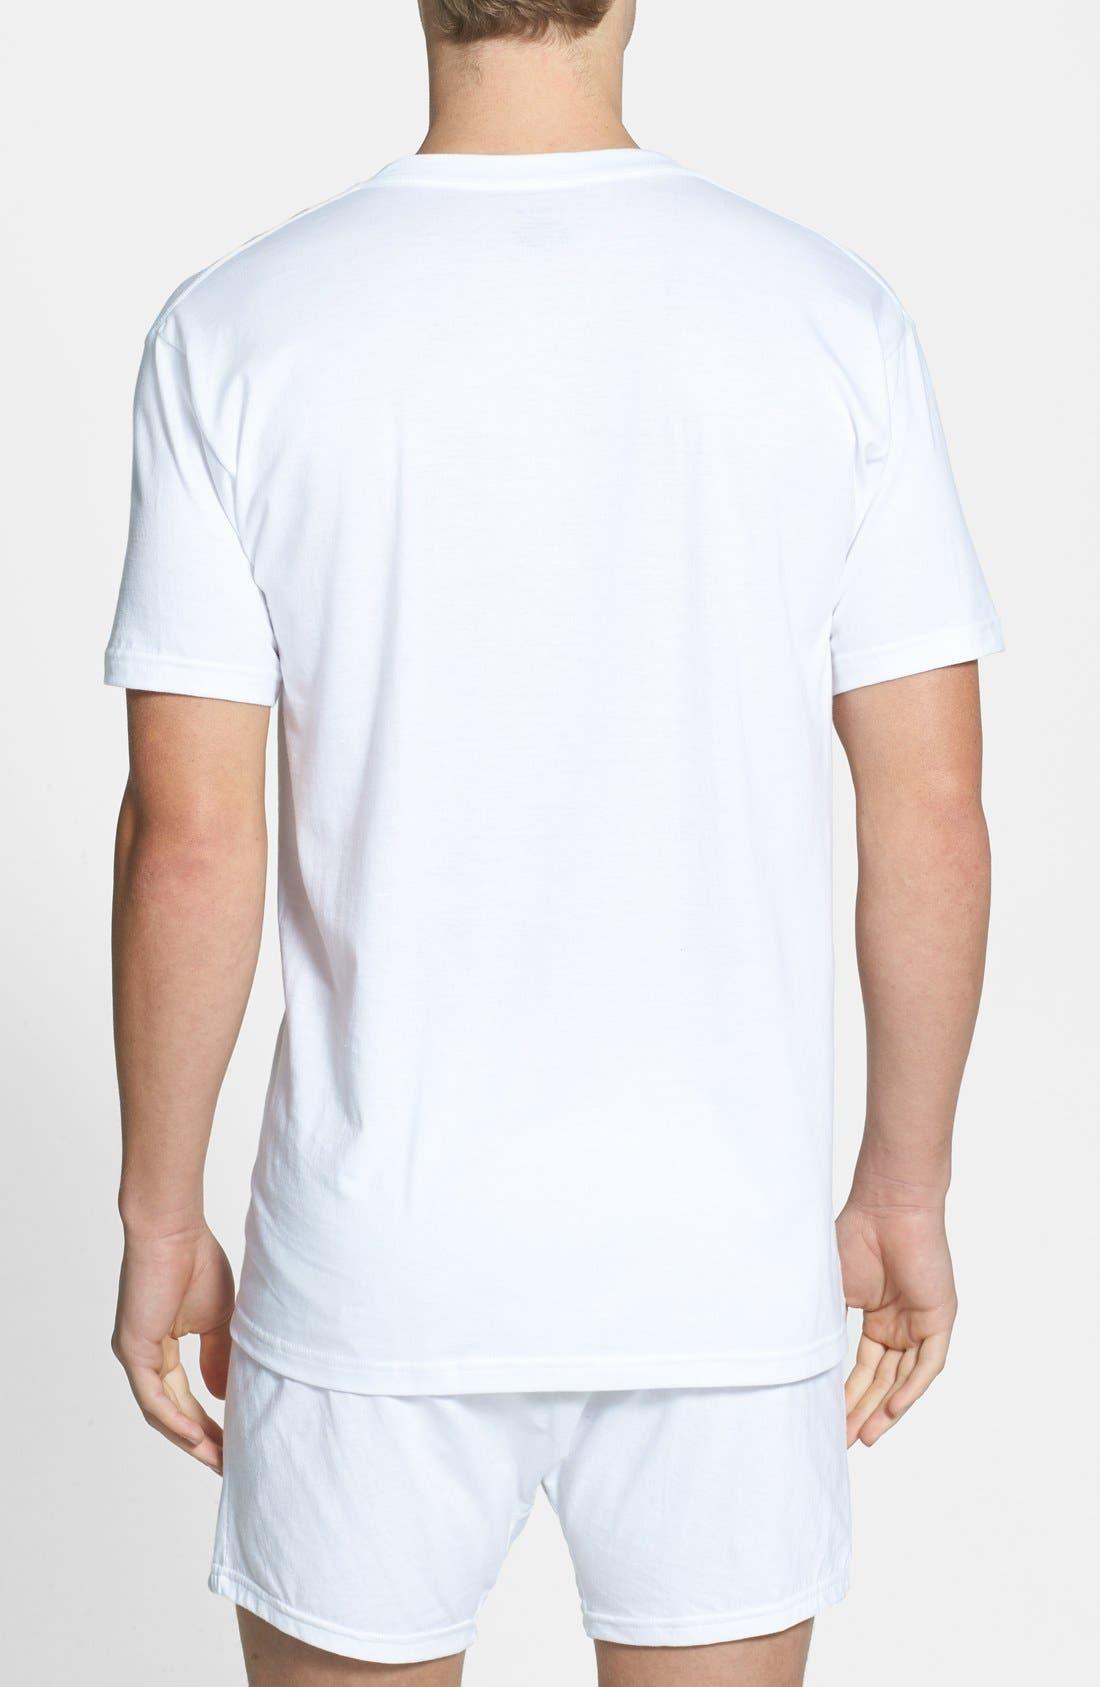 NORDSTROM MEN'S SHOP, 4-Pack Regular Fit Supima<sup>®</sup> Cotton V-Neck T-Shirts, Alternate thumbnail 7, color, WHITE